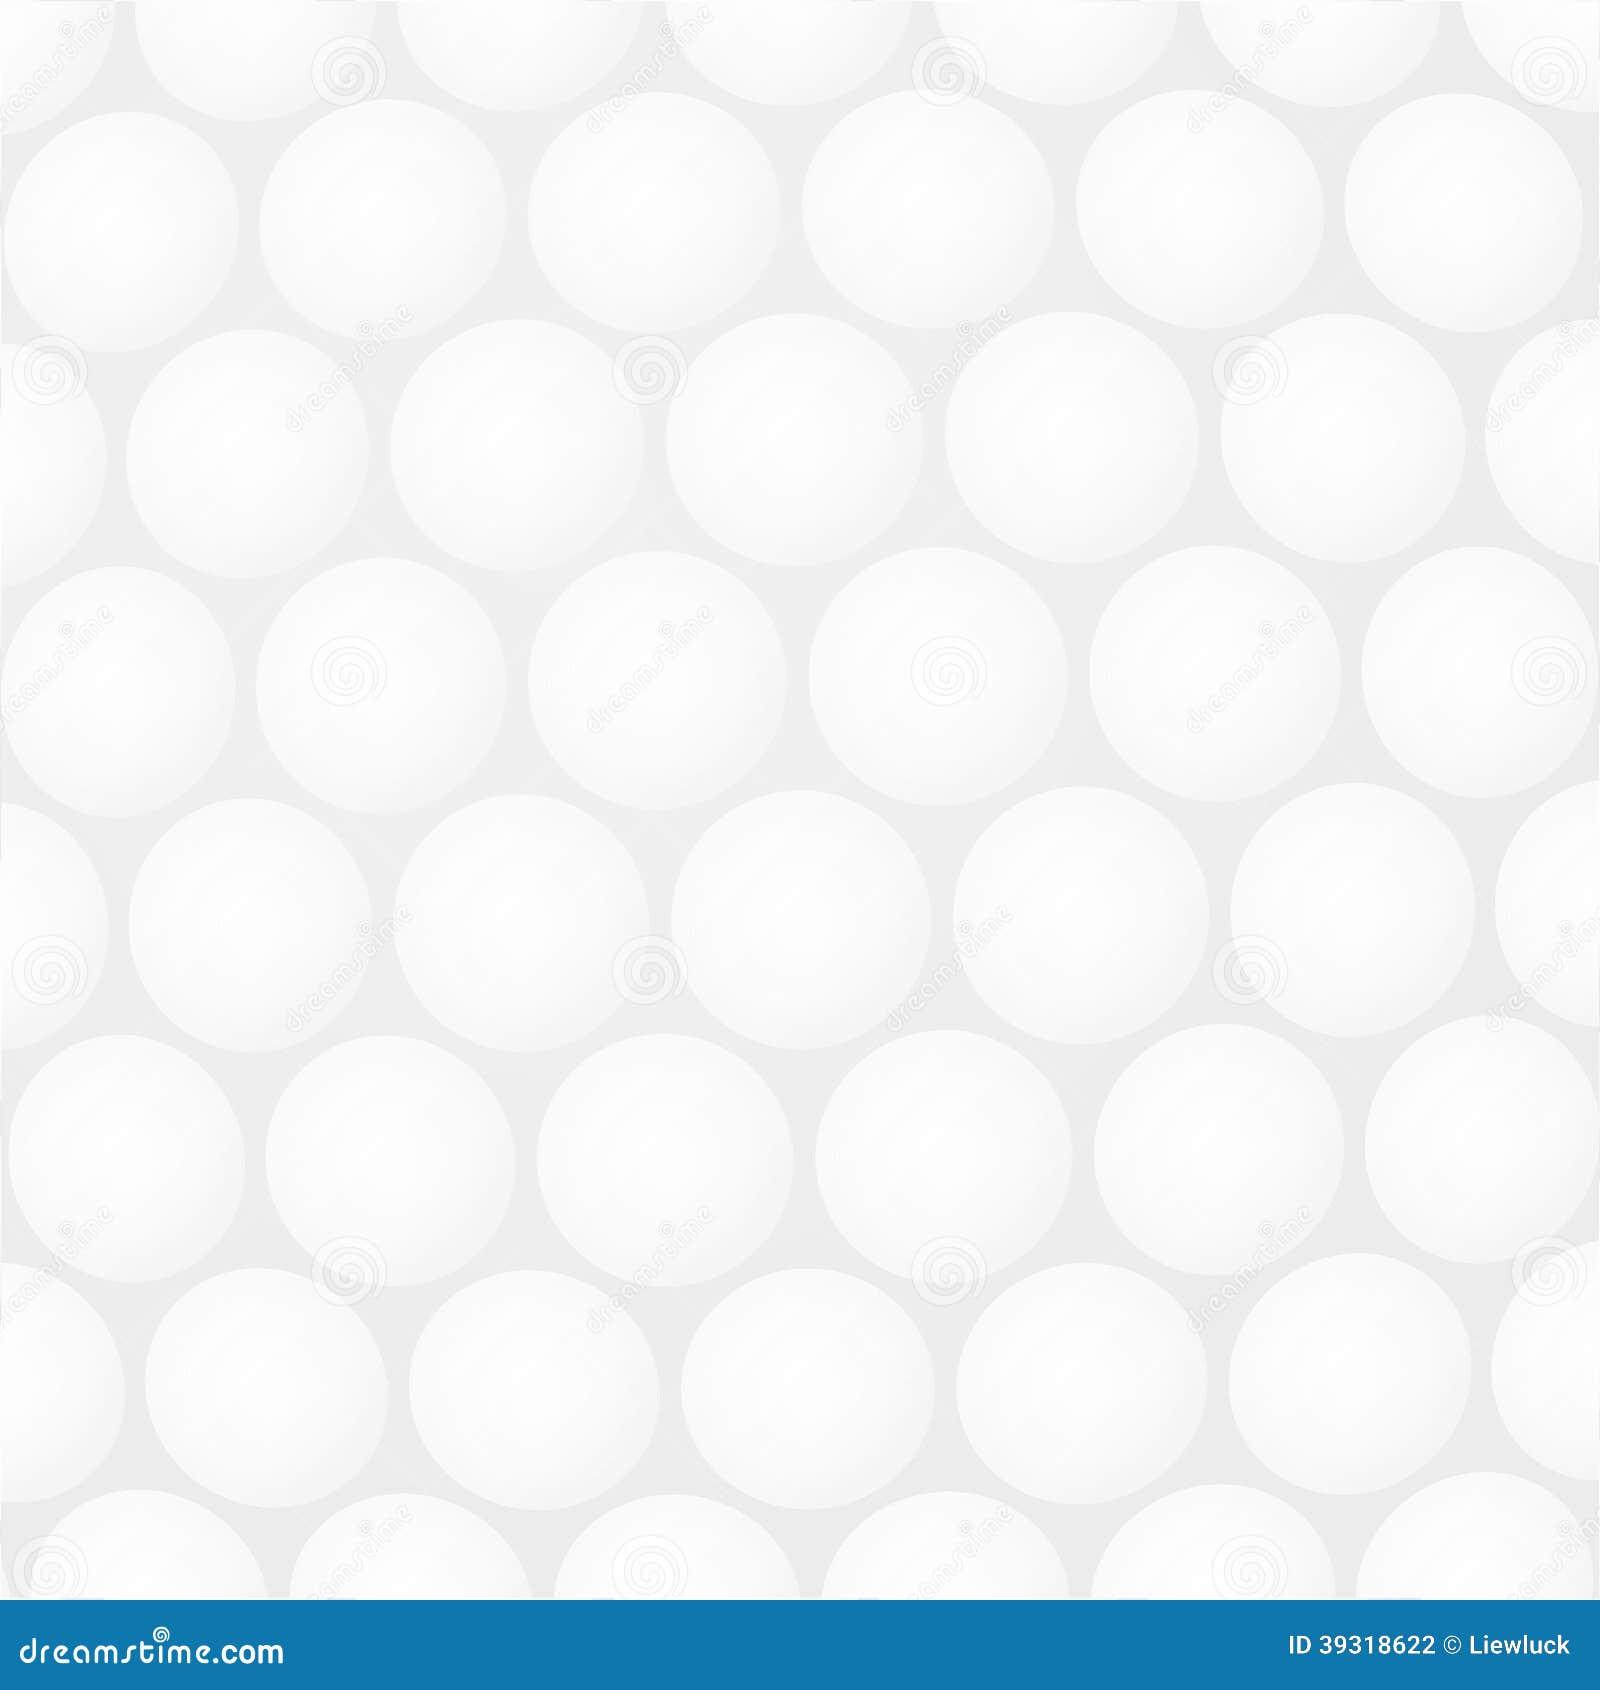 golf ball background stock vector illustration of